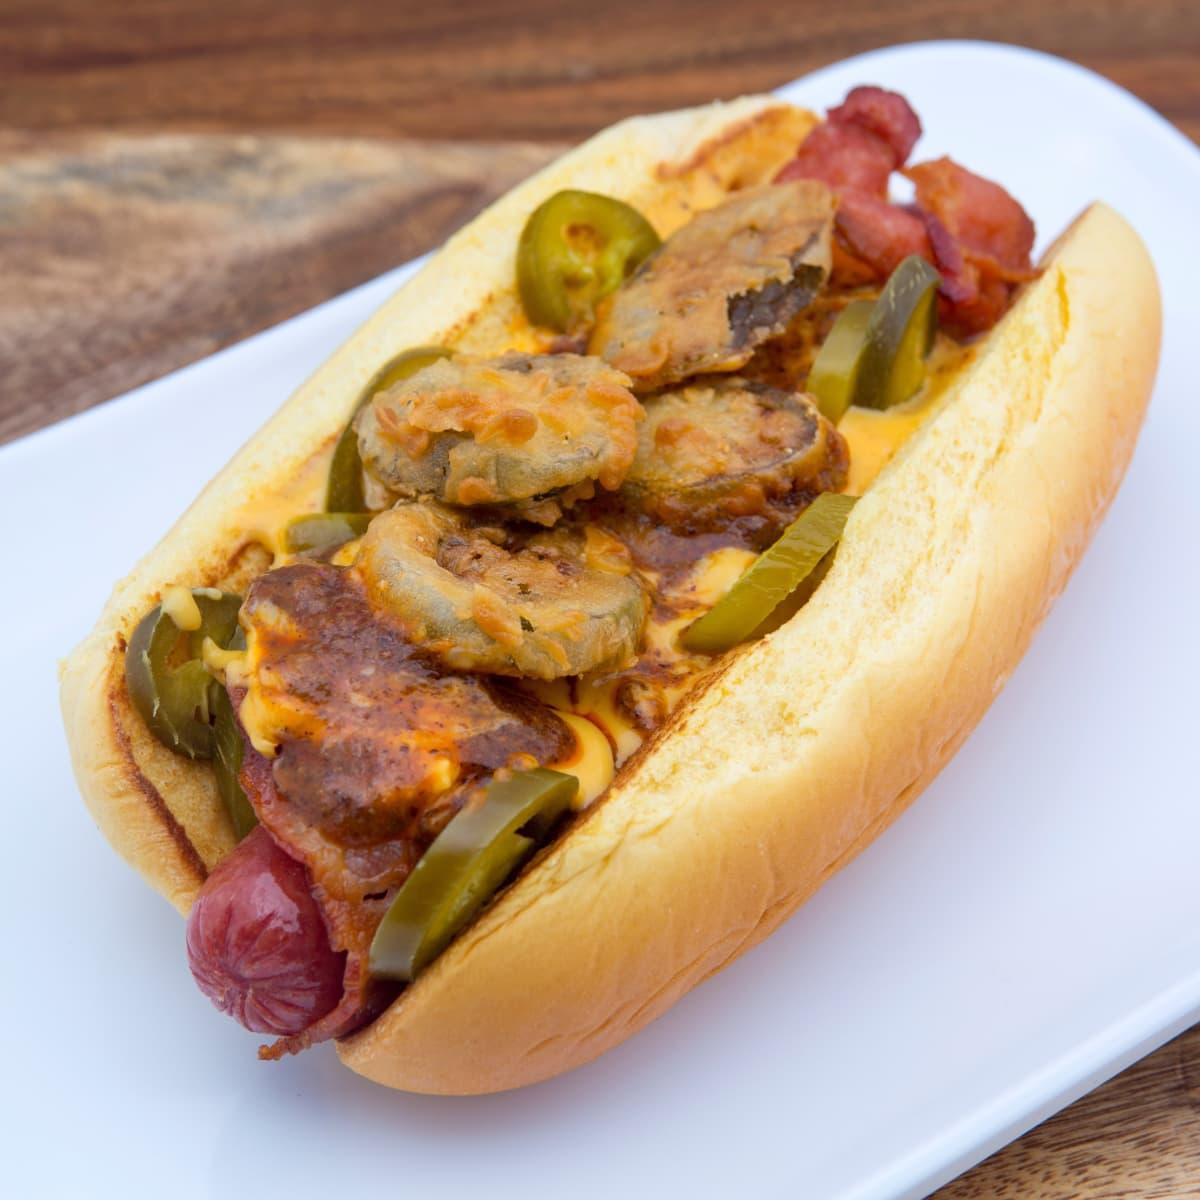 James Coney Island JCI Houston Dog, hot dog